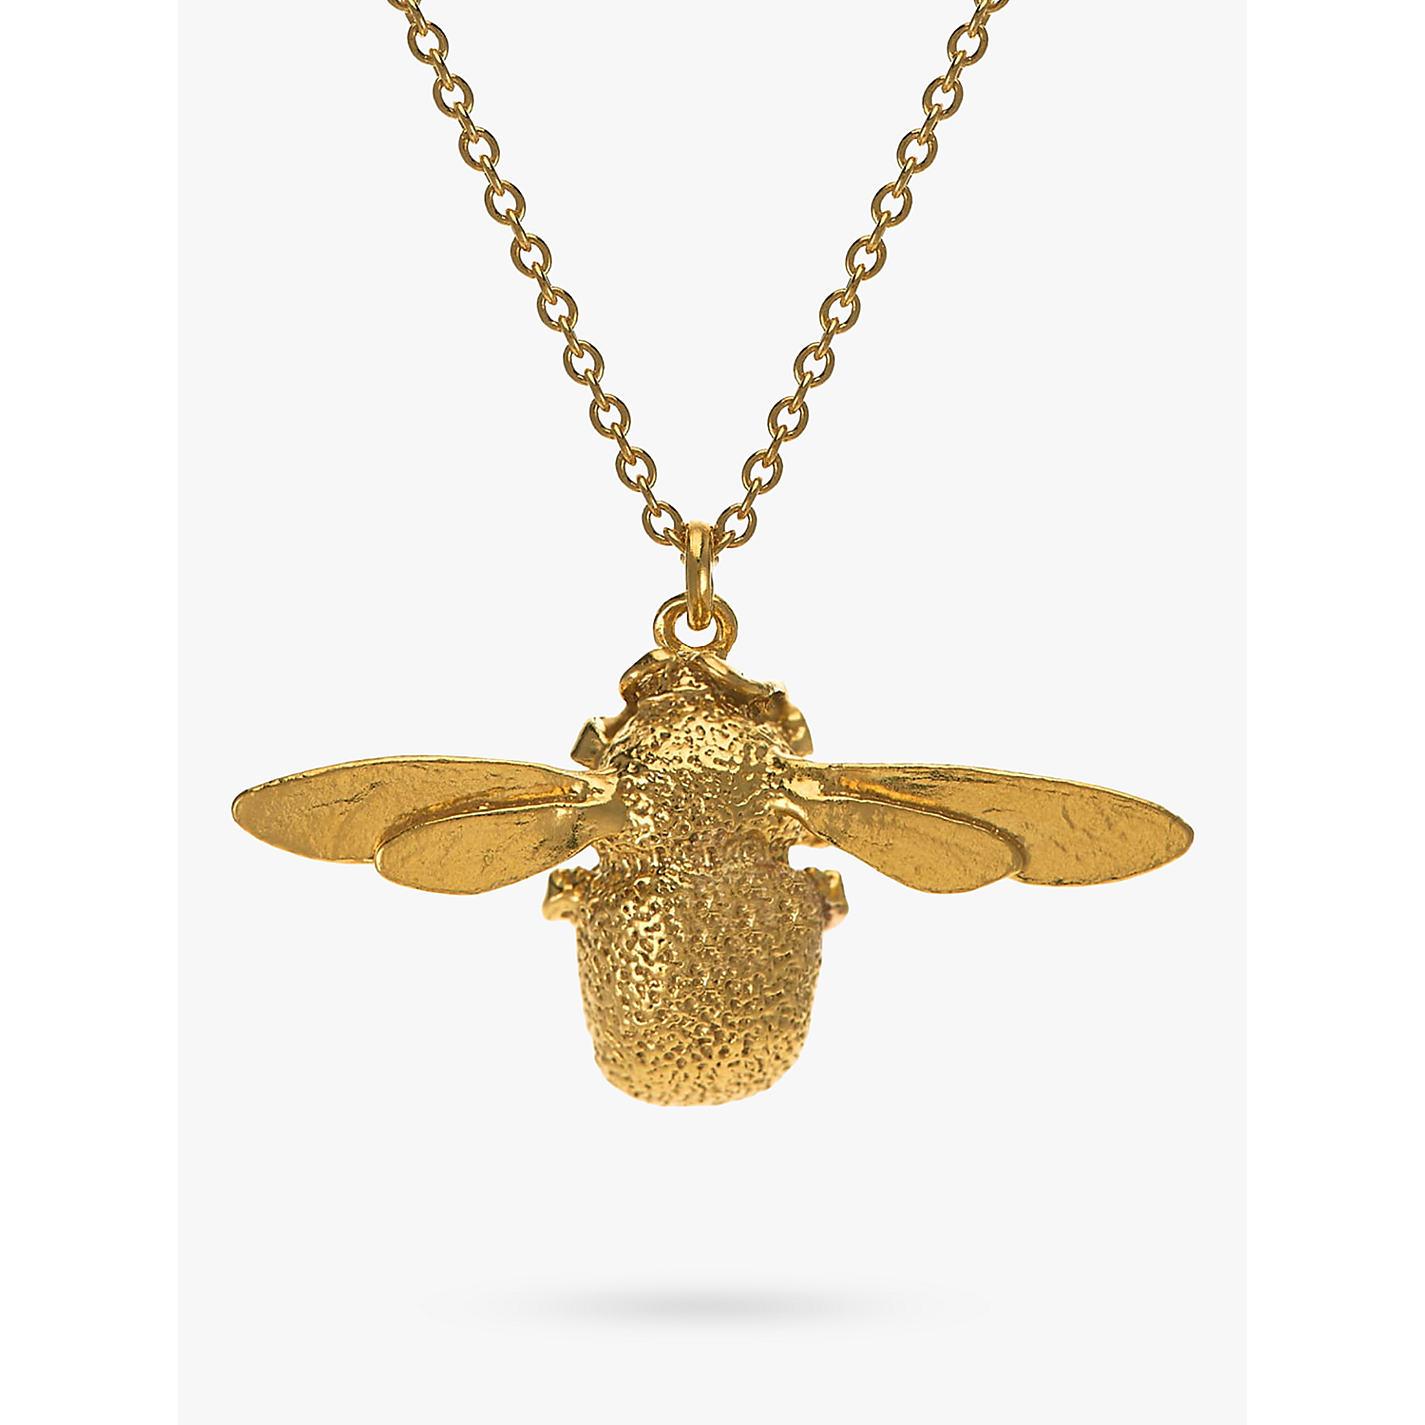 Buy alex monroe 22ct gold vermeil bumble bee pendant necklace buy alex monroe 22ct gold vermeil bumble bee pendant necklace gold online at johnlewis aloadofball Choice Image